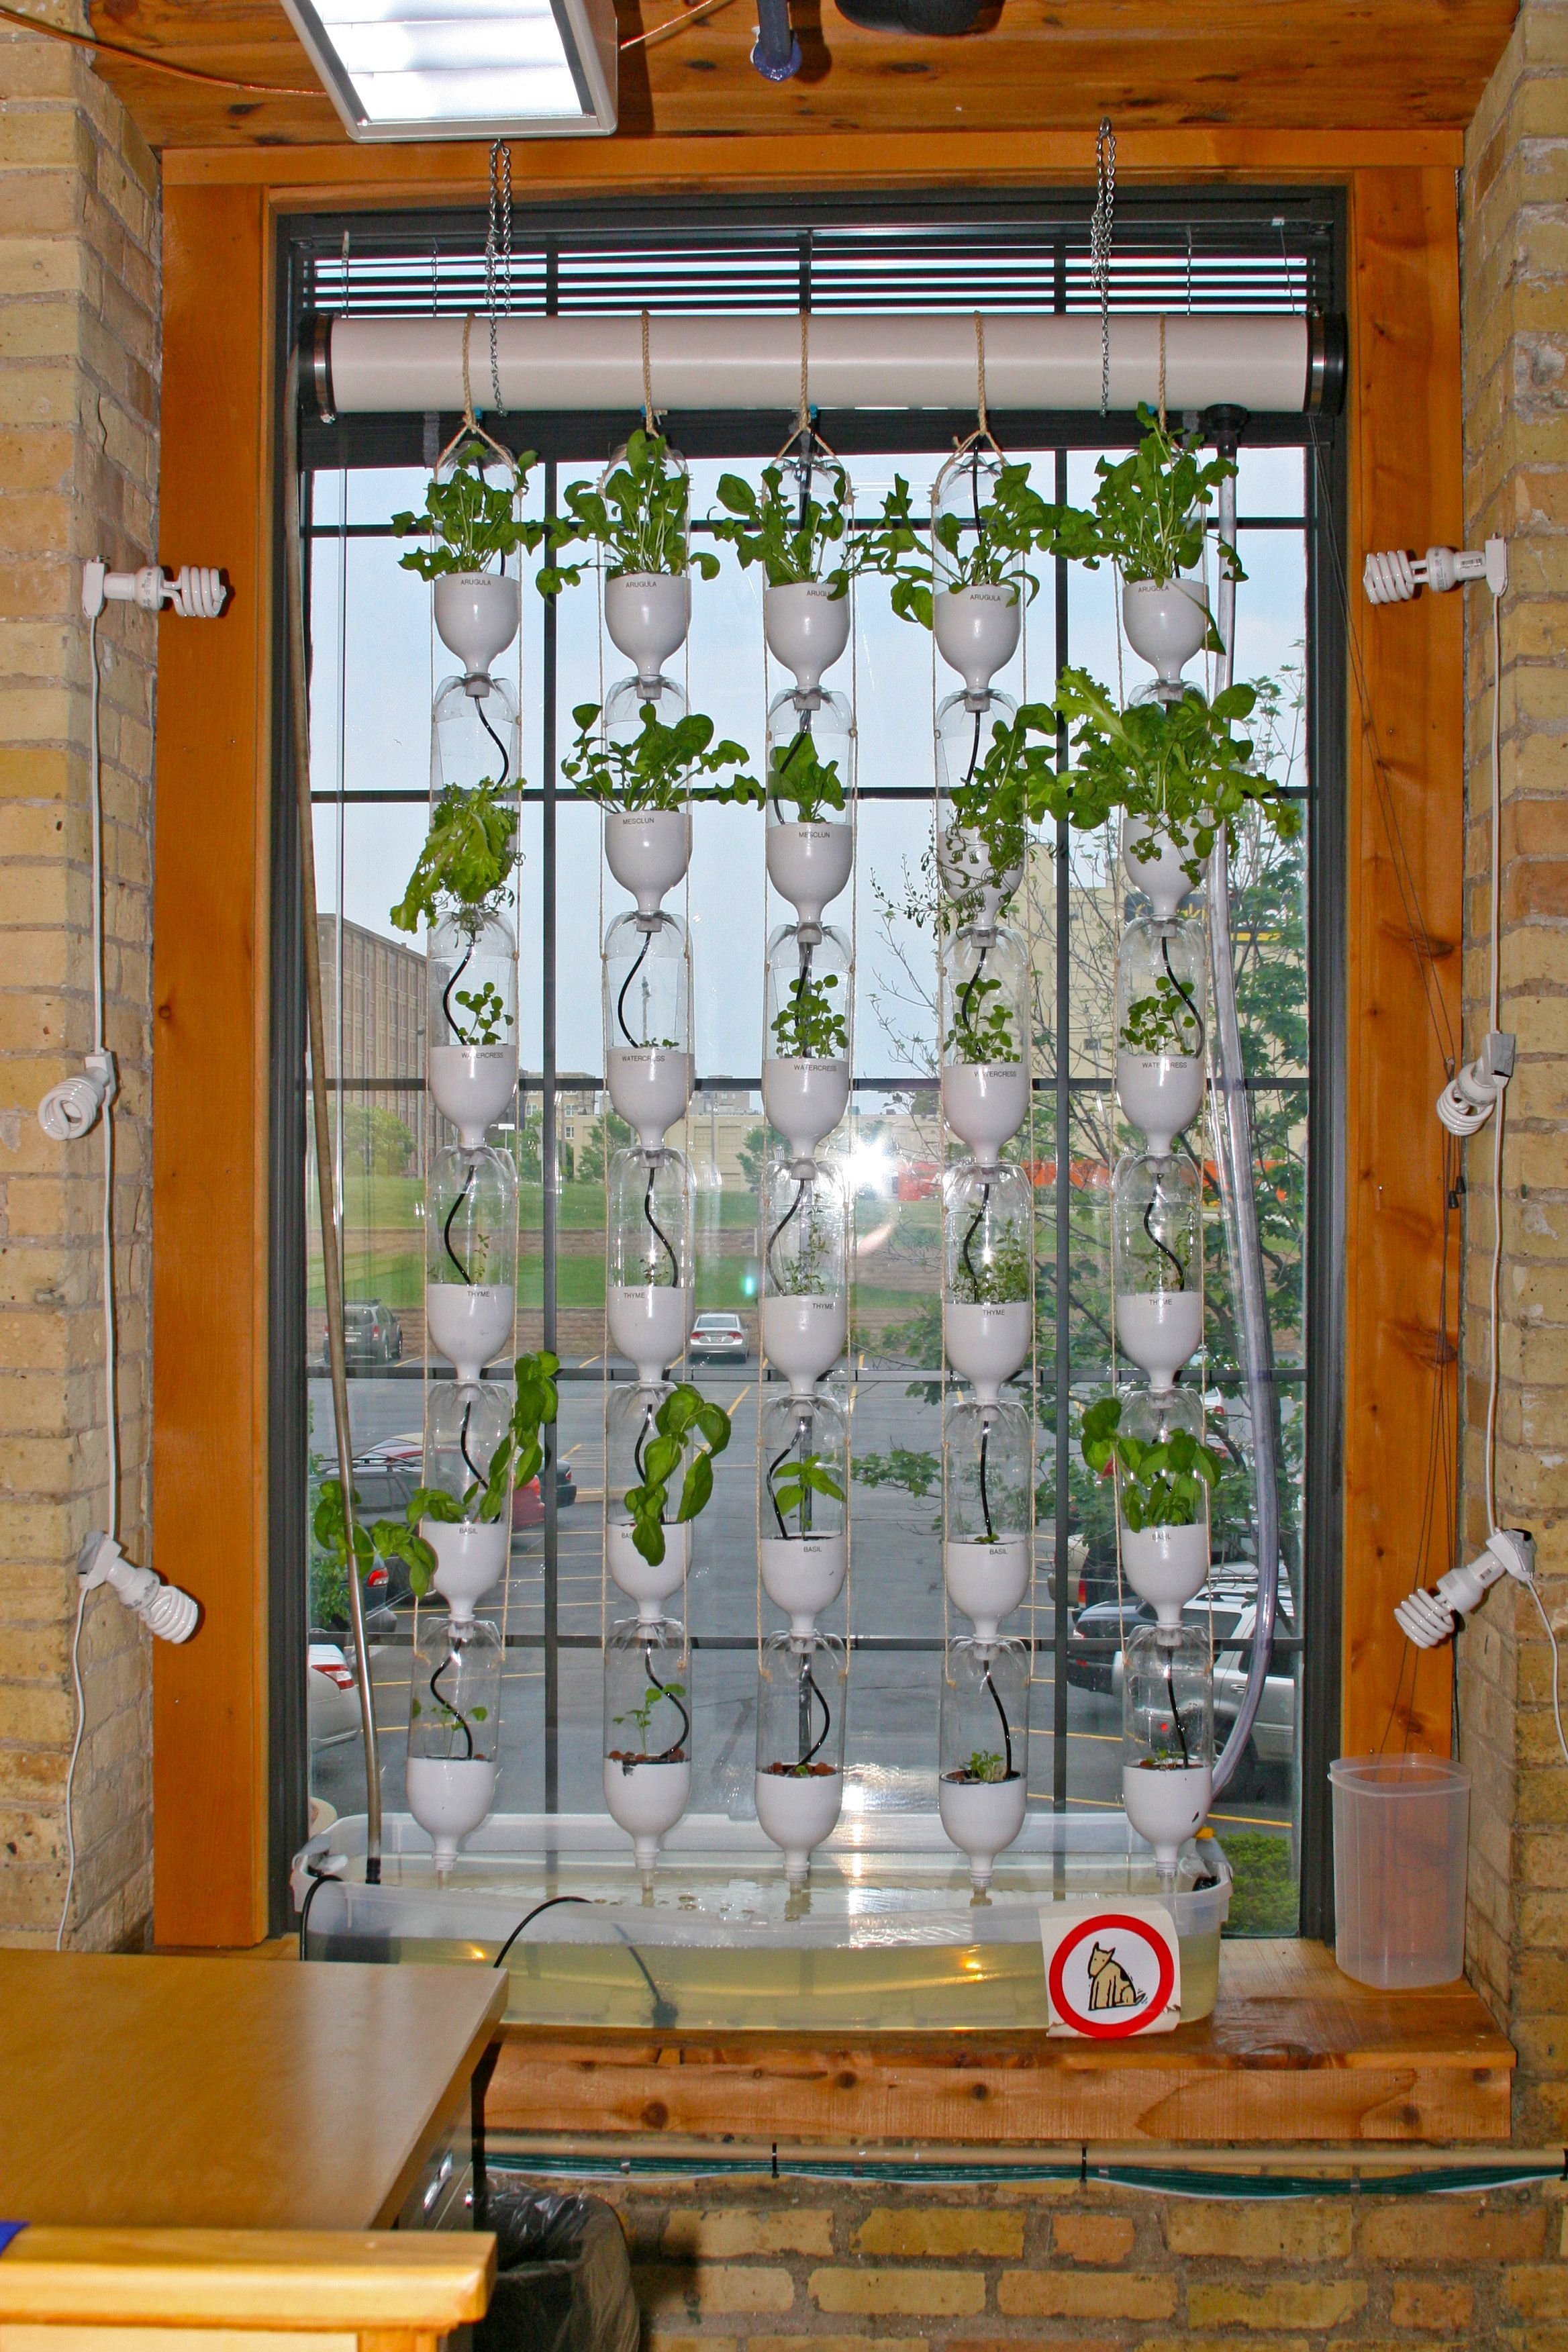 34f408e8b9783ad344a56b89c9856e1f - Which Plastics Are Safe For Gardening